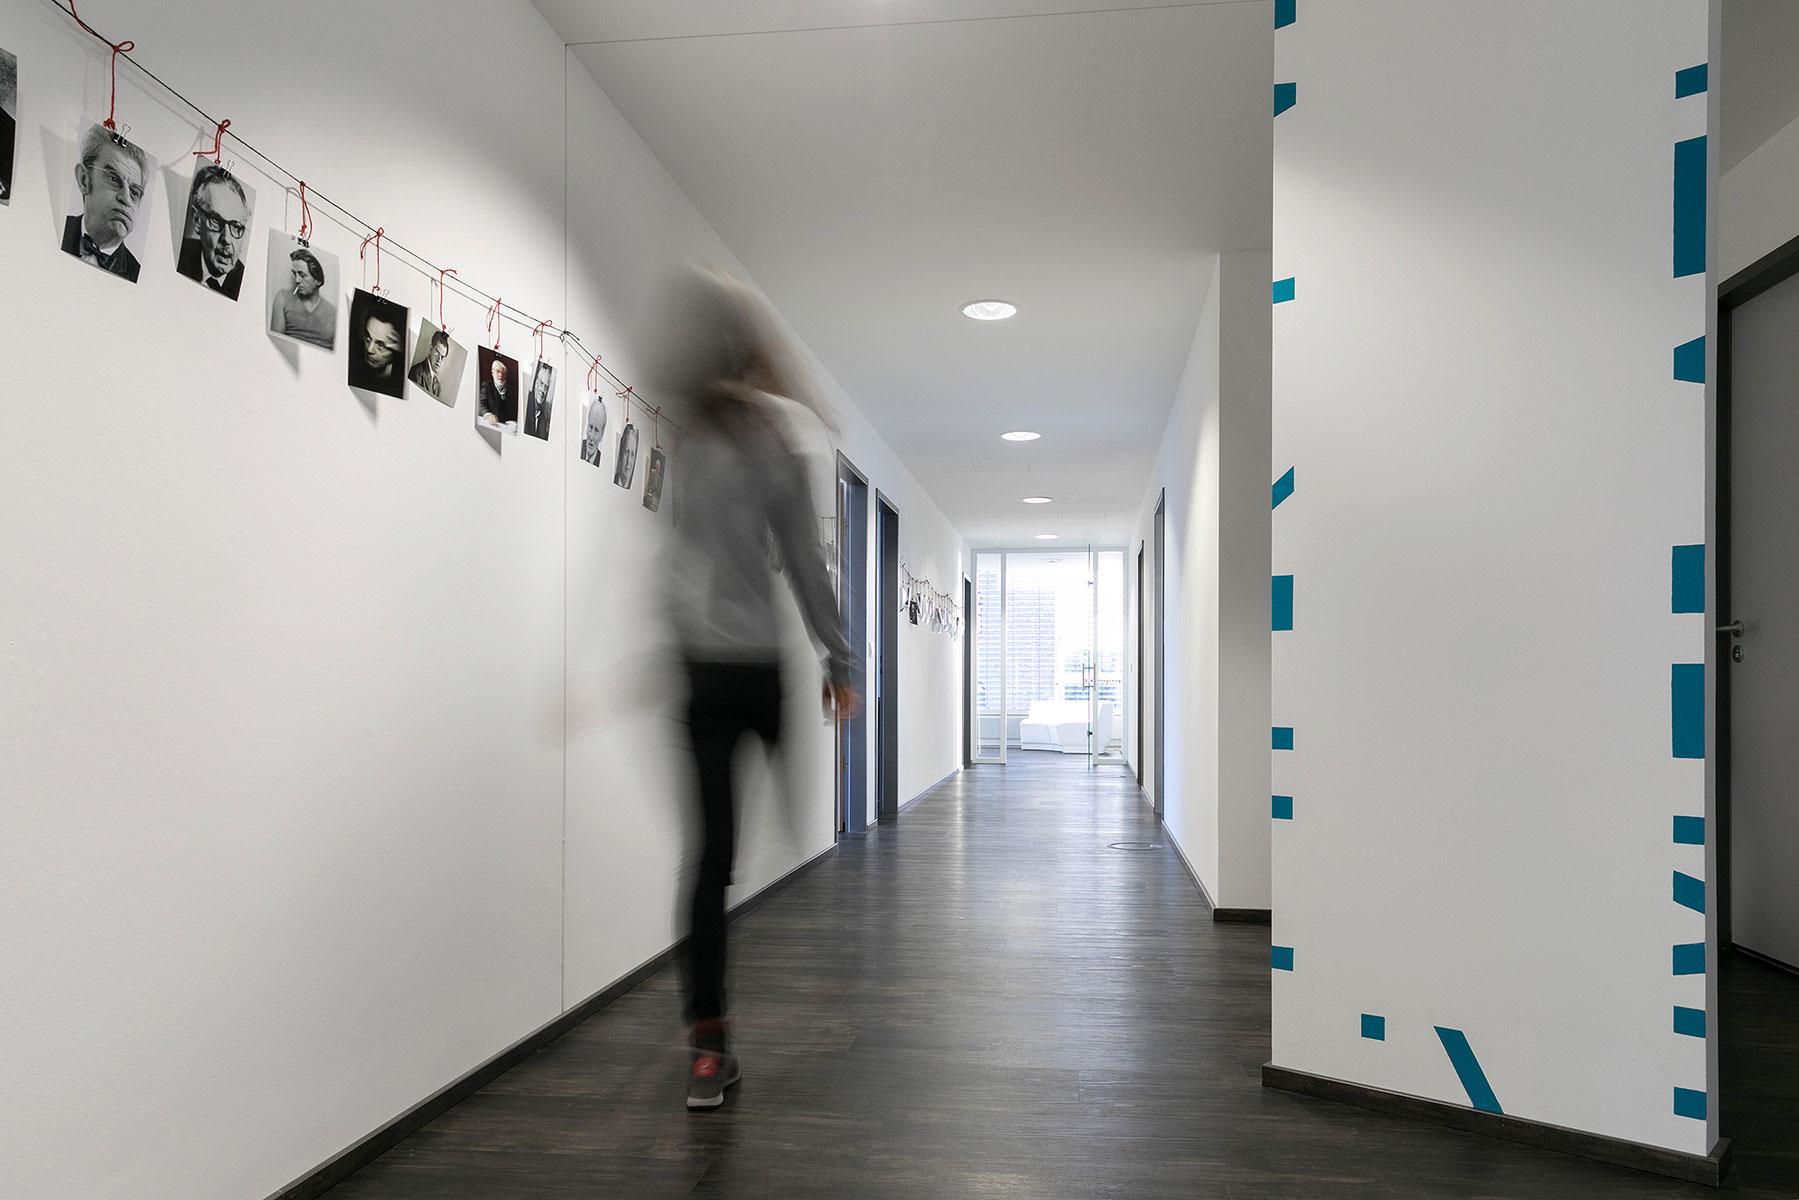 Flur Modern Meeting / Konferenz Raum - Bonn Rhein